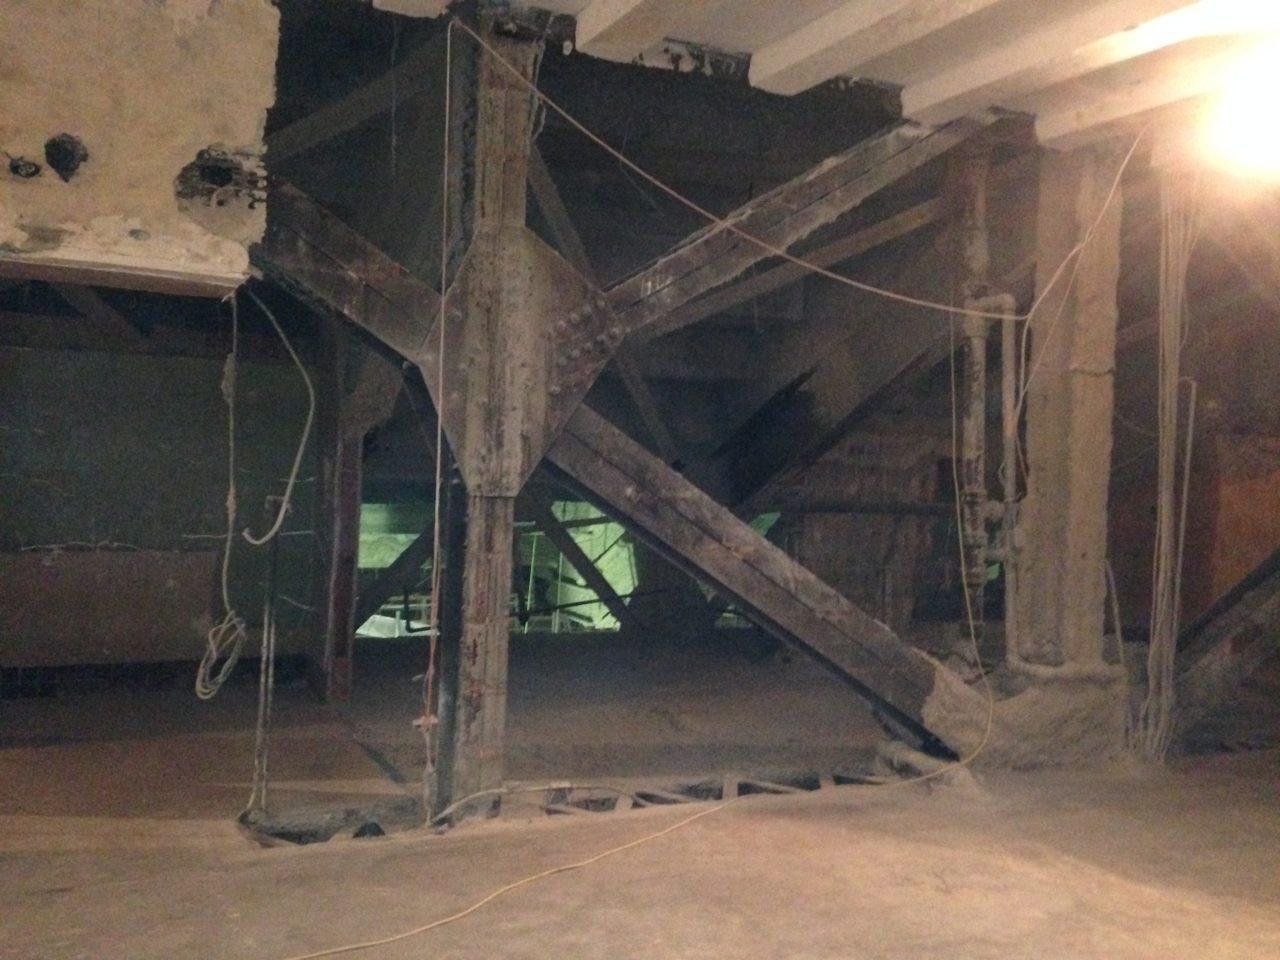 Steel support girders under balcony